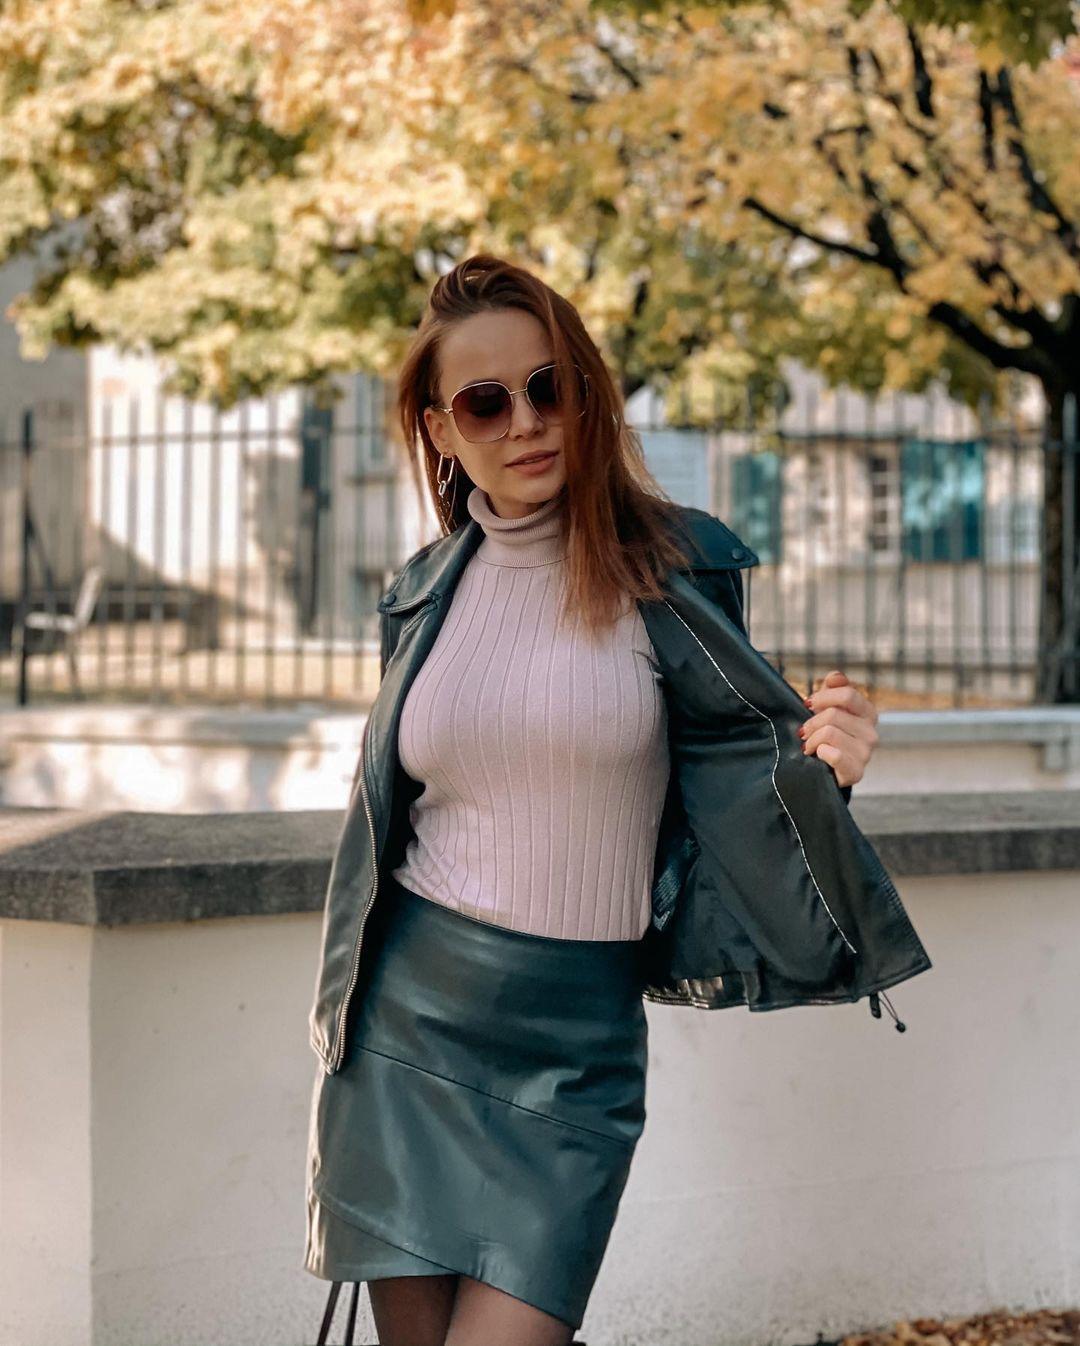 Angelina-Petrova-Wallpapers-Insta-Fit-Bio-2